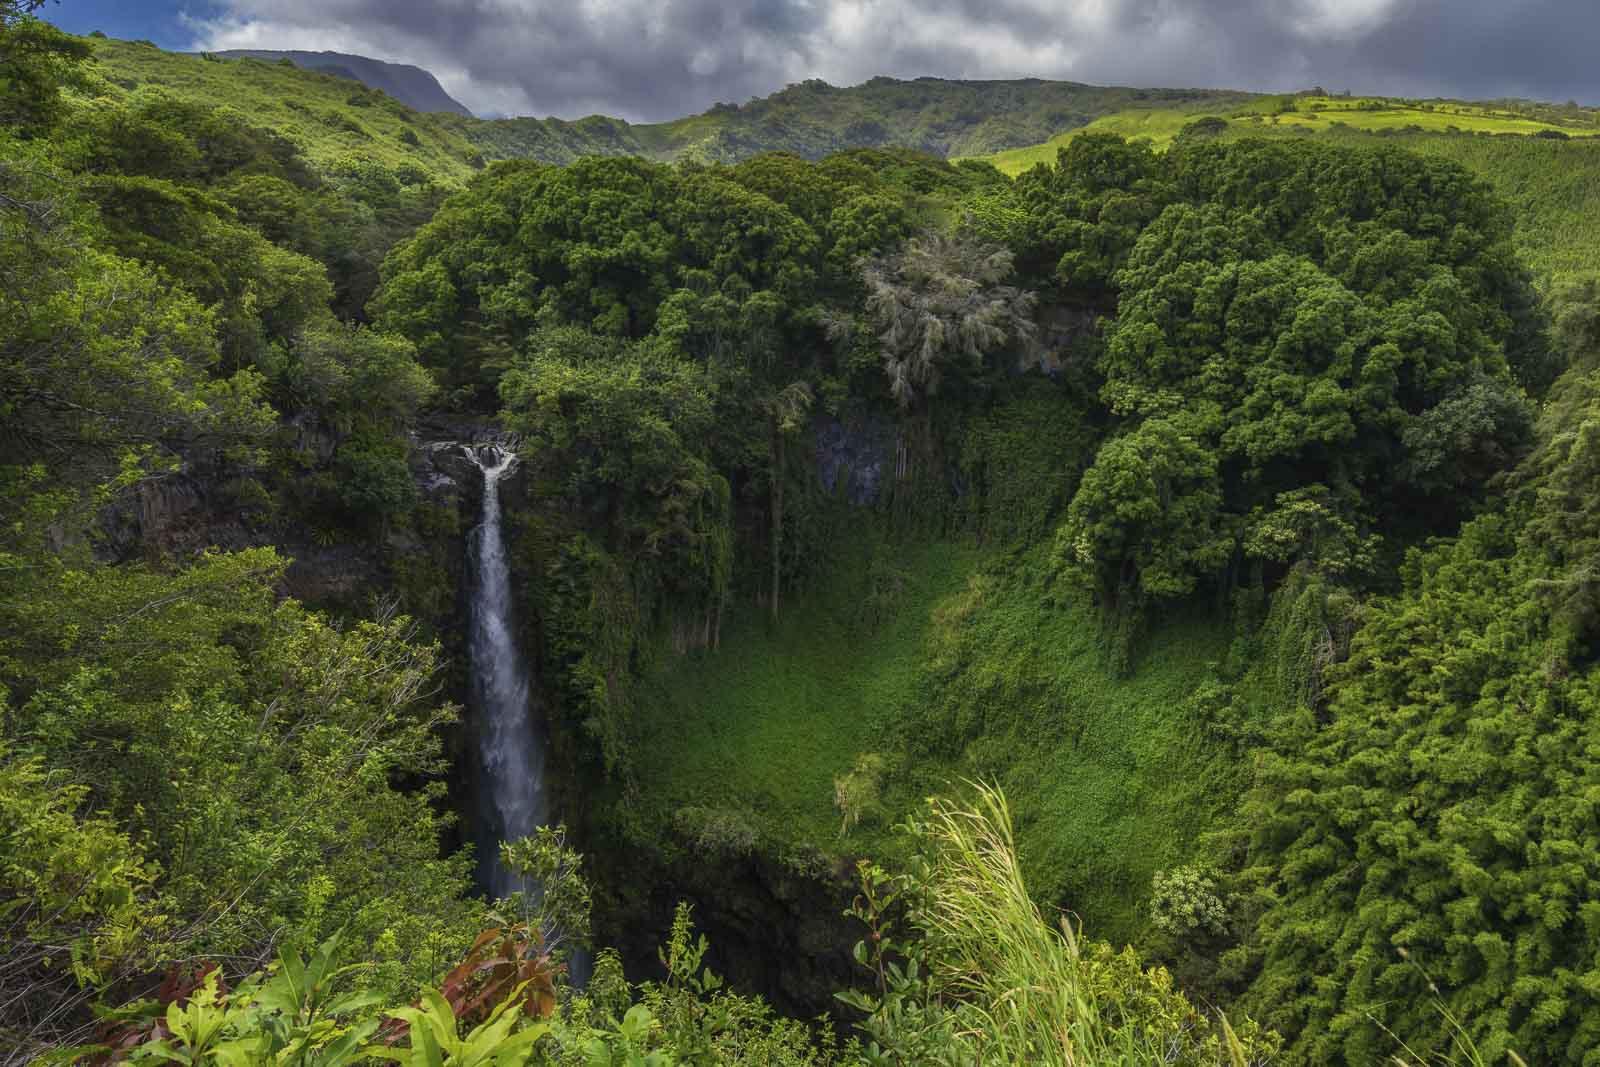 Fact: King Kamehameha united Hawaii